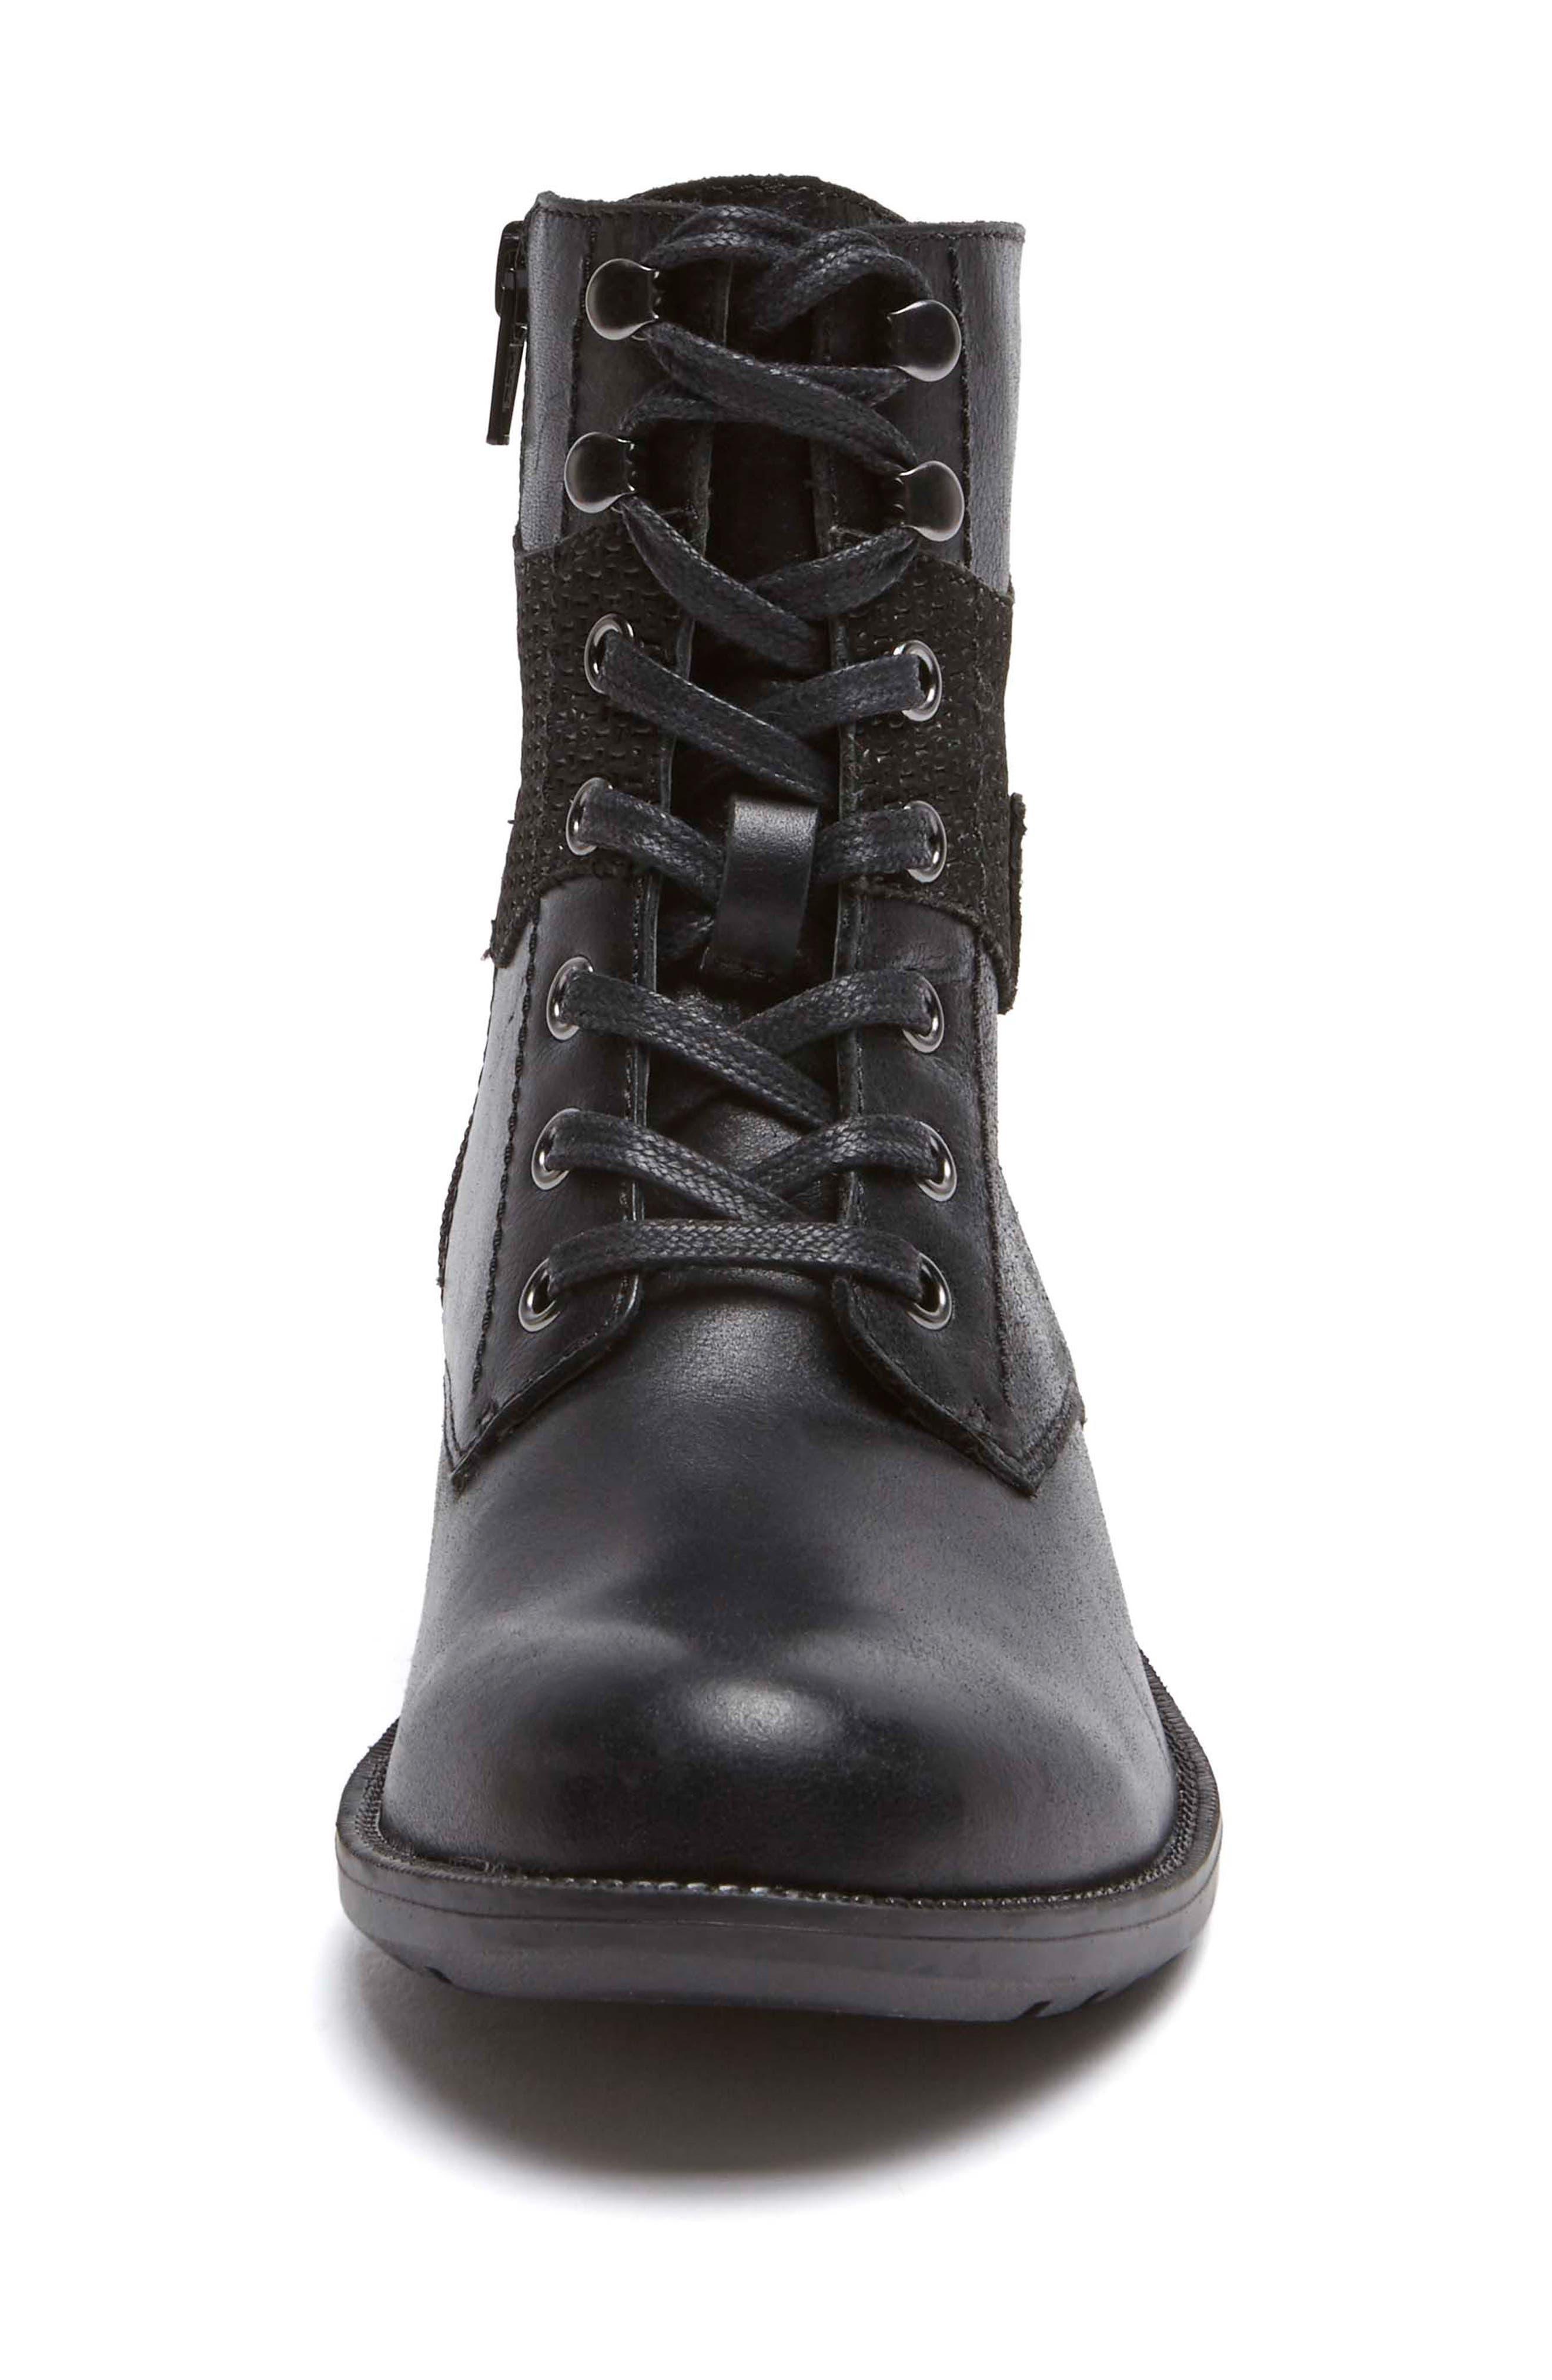 Copley Waterproof Combat Boot,                             Alternate thumbnail 4, color,                             BLACK LEATHER